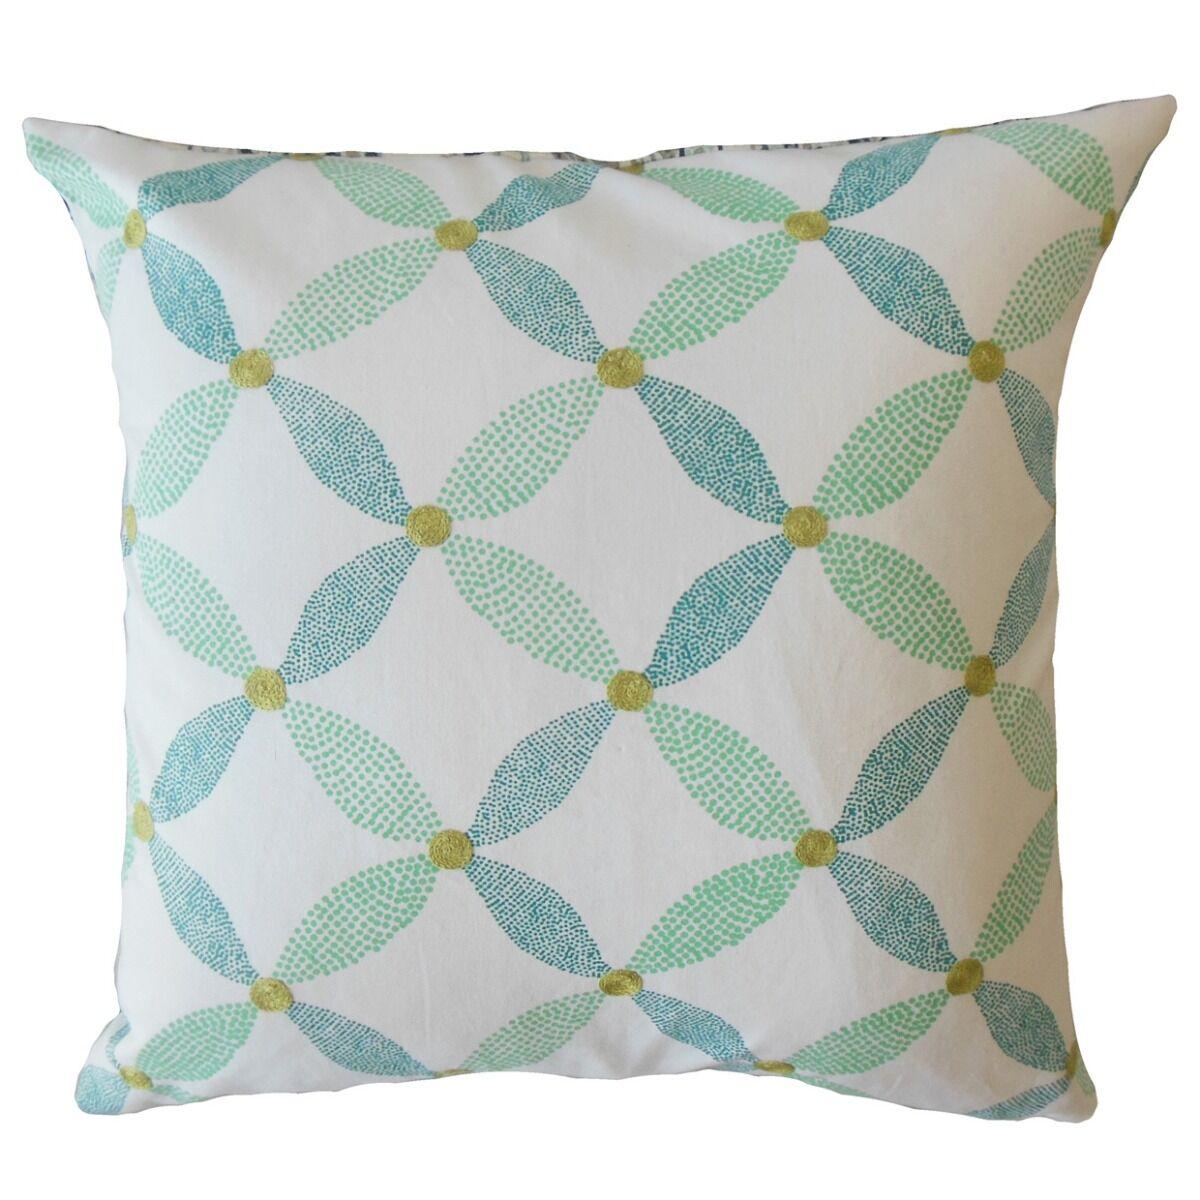 Desdemona Graphic Cotton Pillow Size: 20